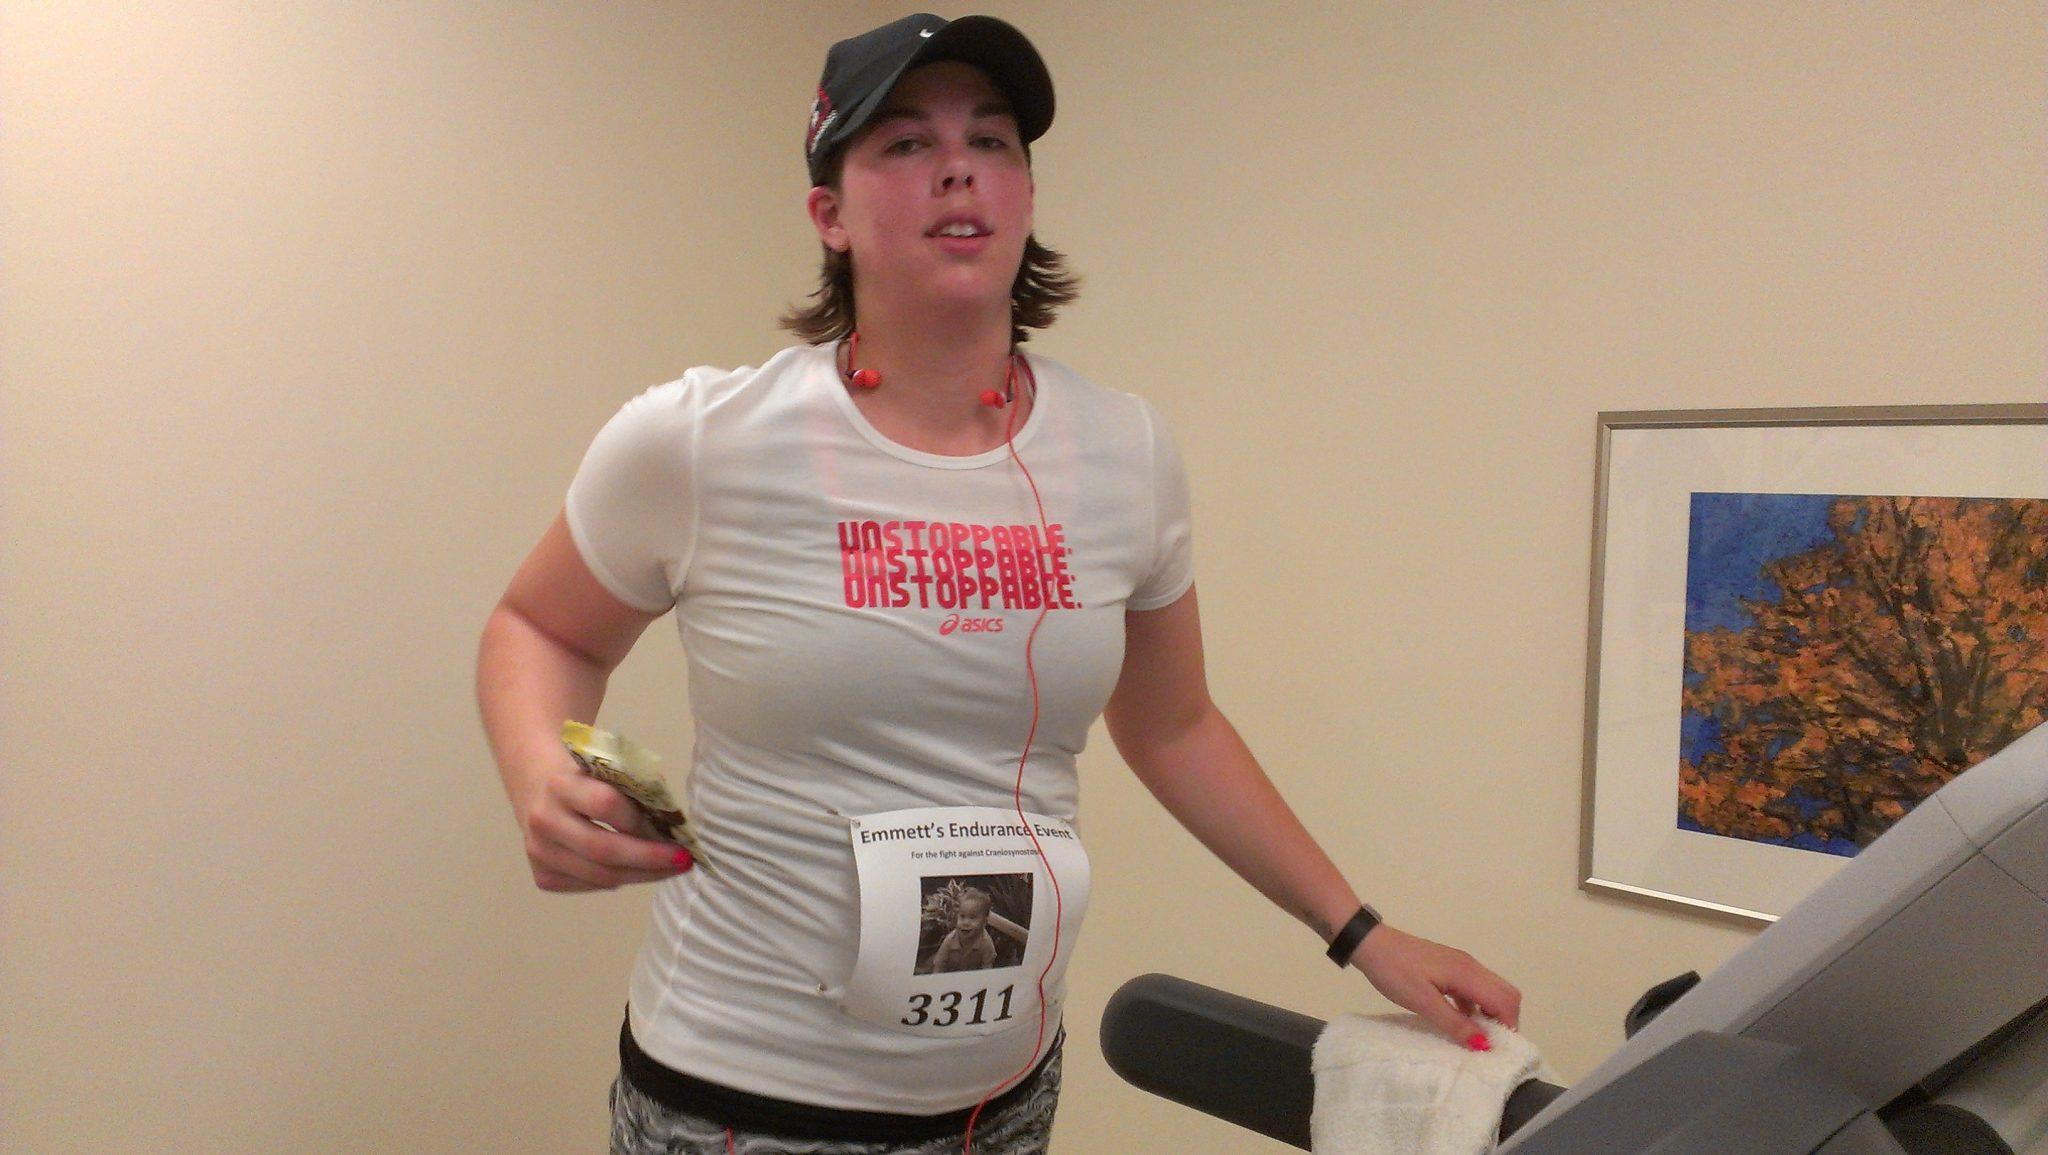 Kathy, running on the hospital treadmill.